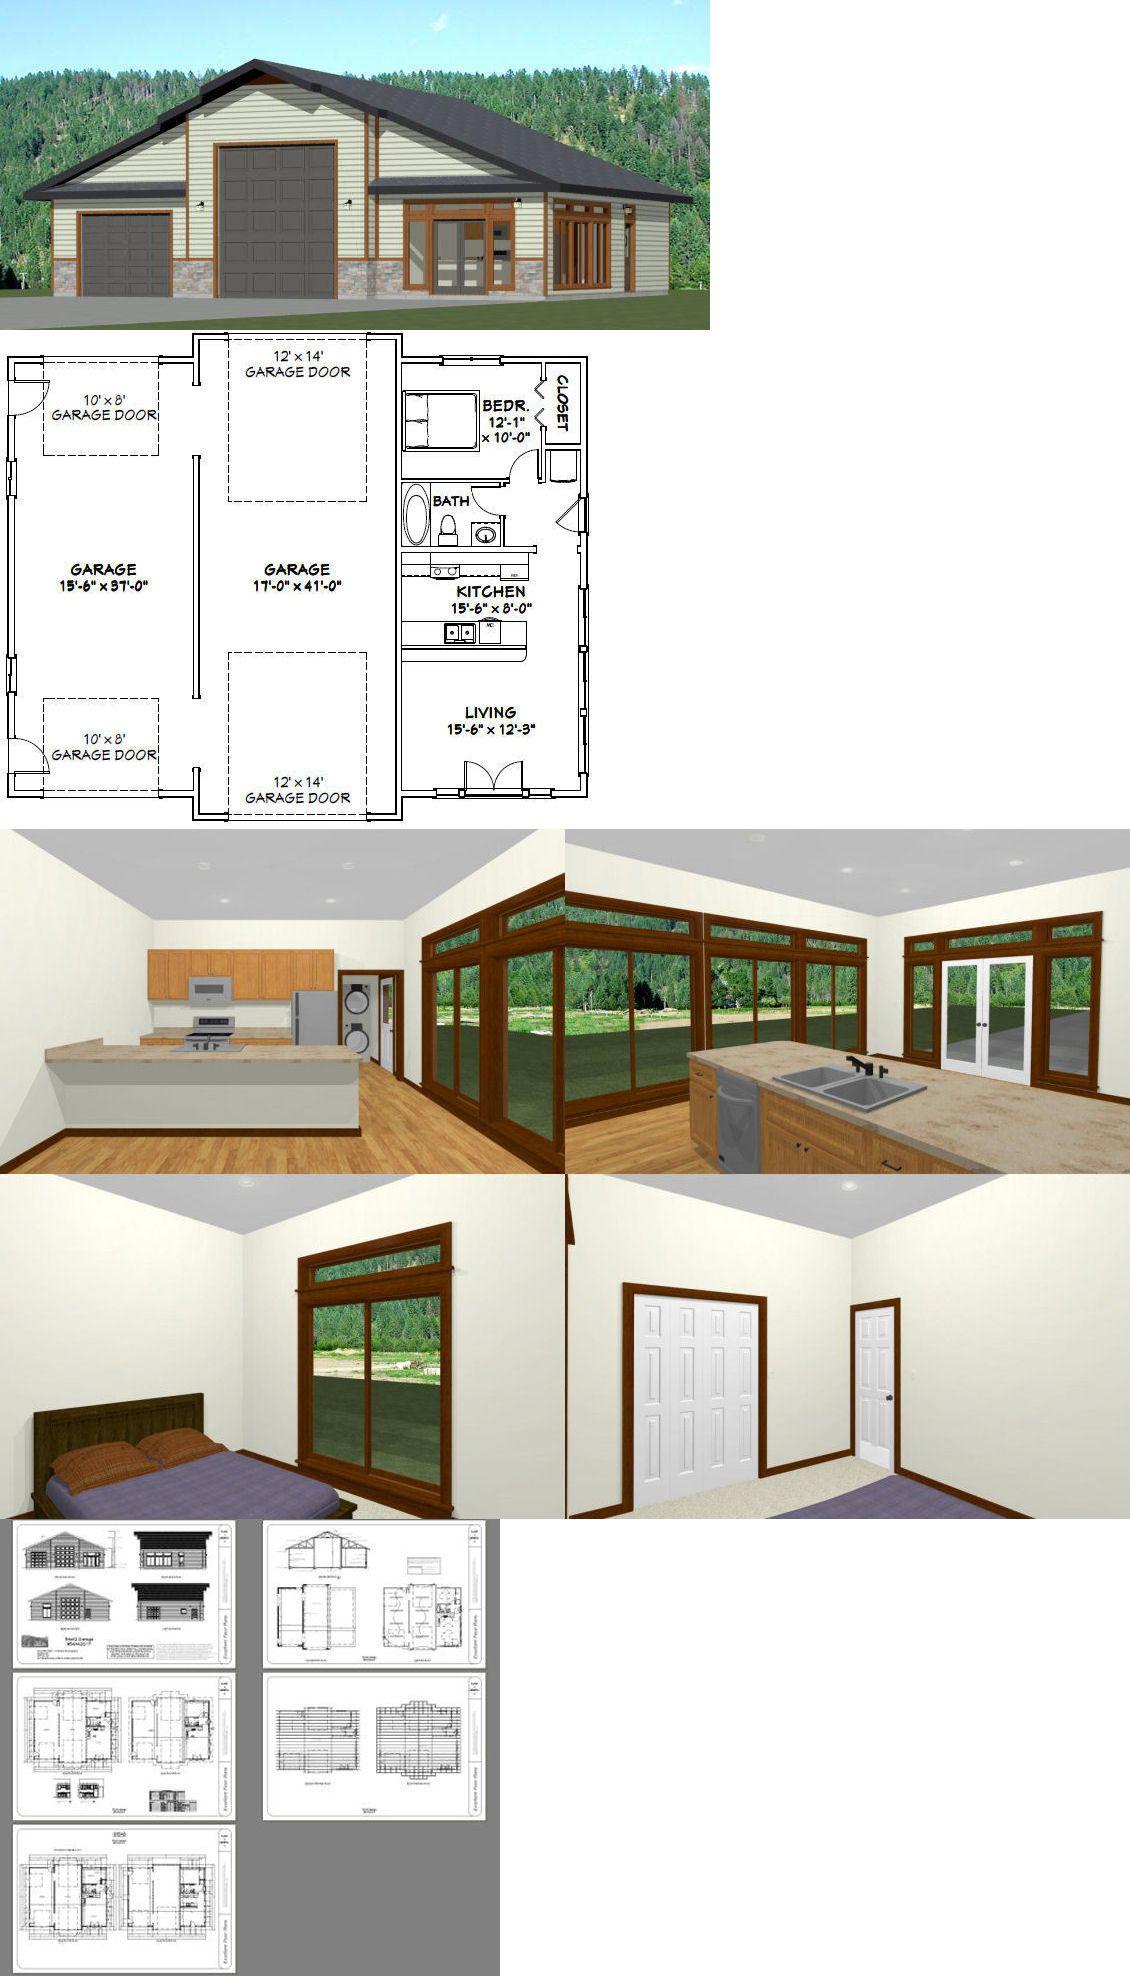 Building Plans And Blueprints 42130 50x42 1 Car 1 Rv Garage 1 Br 1